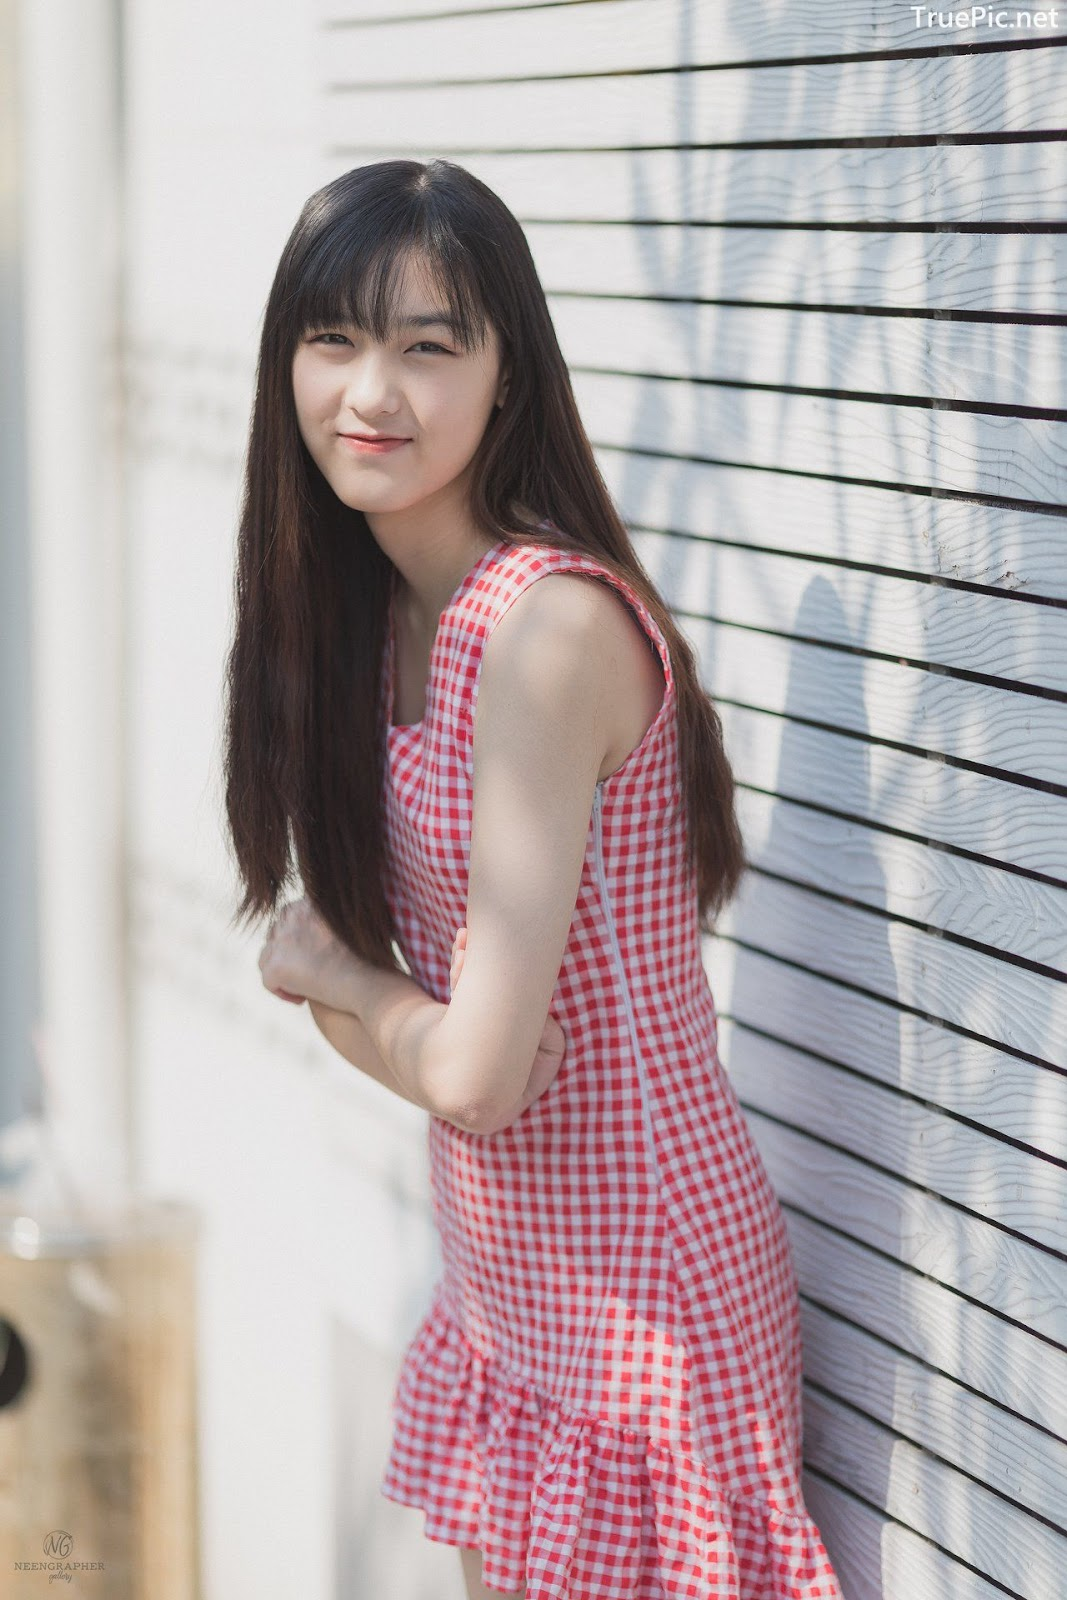 Image-Thailand-Cute-Model-Emma-Panisara–Album-Emma-Bright-Sunday-TruePic.net- Picture-4